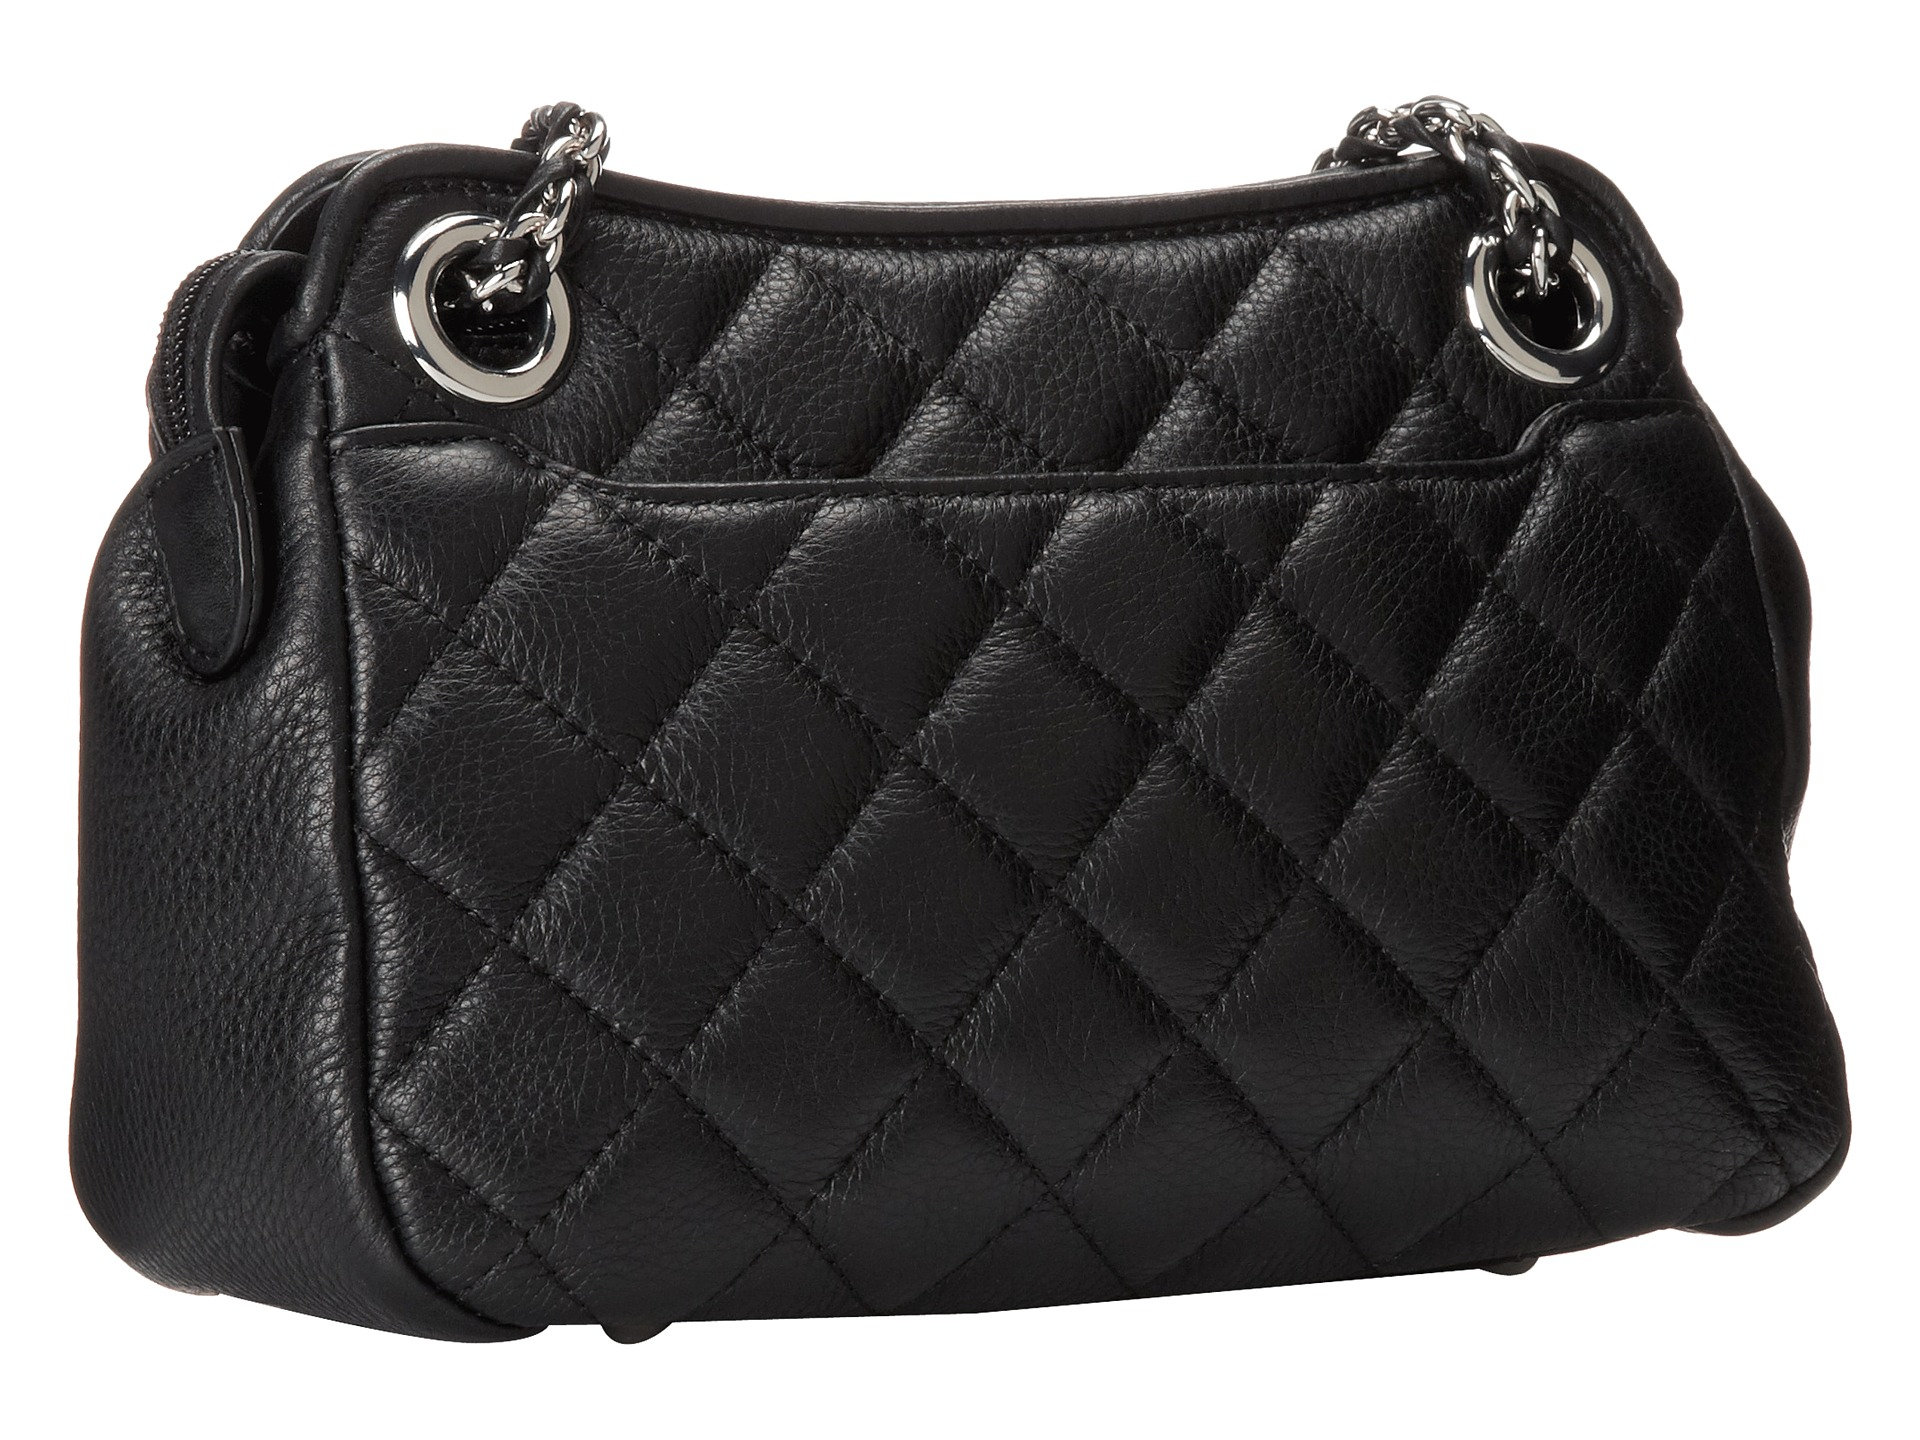 Calvin Klein Quilted Leather Tassel Crossbody In Black Lyst